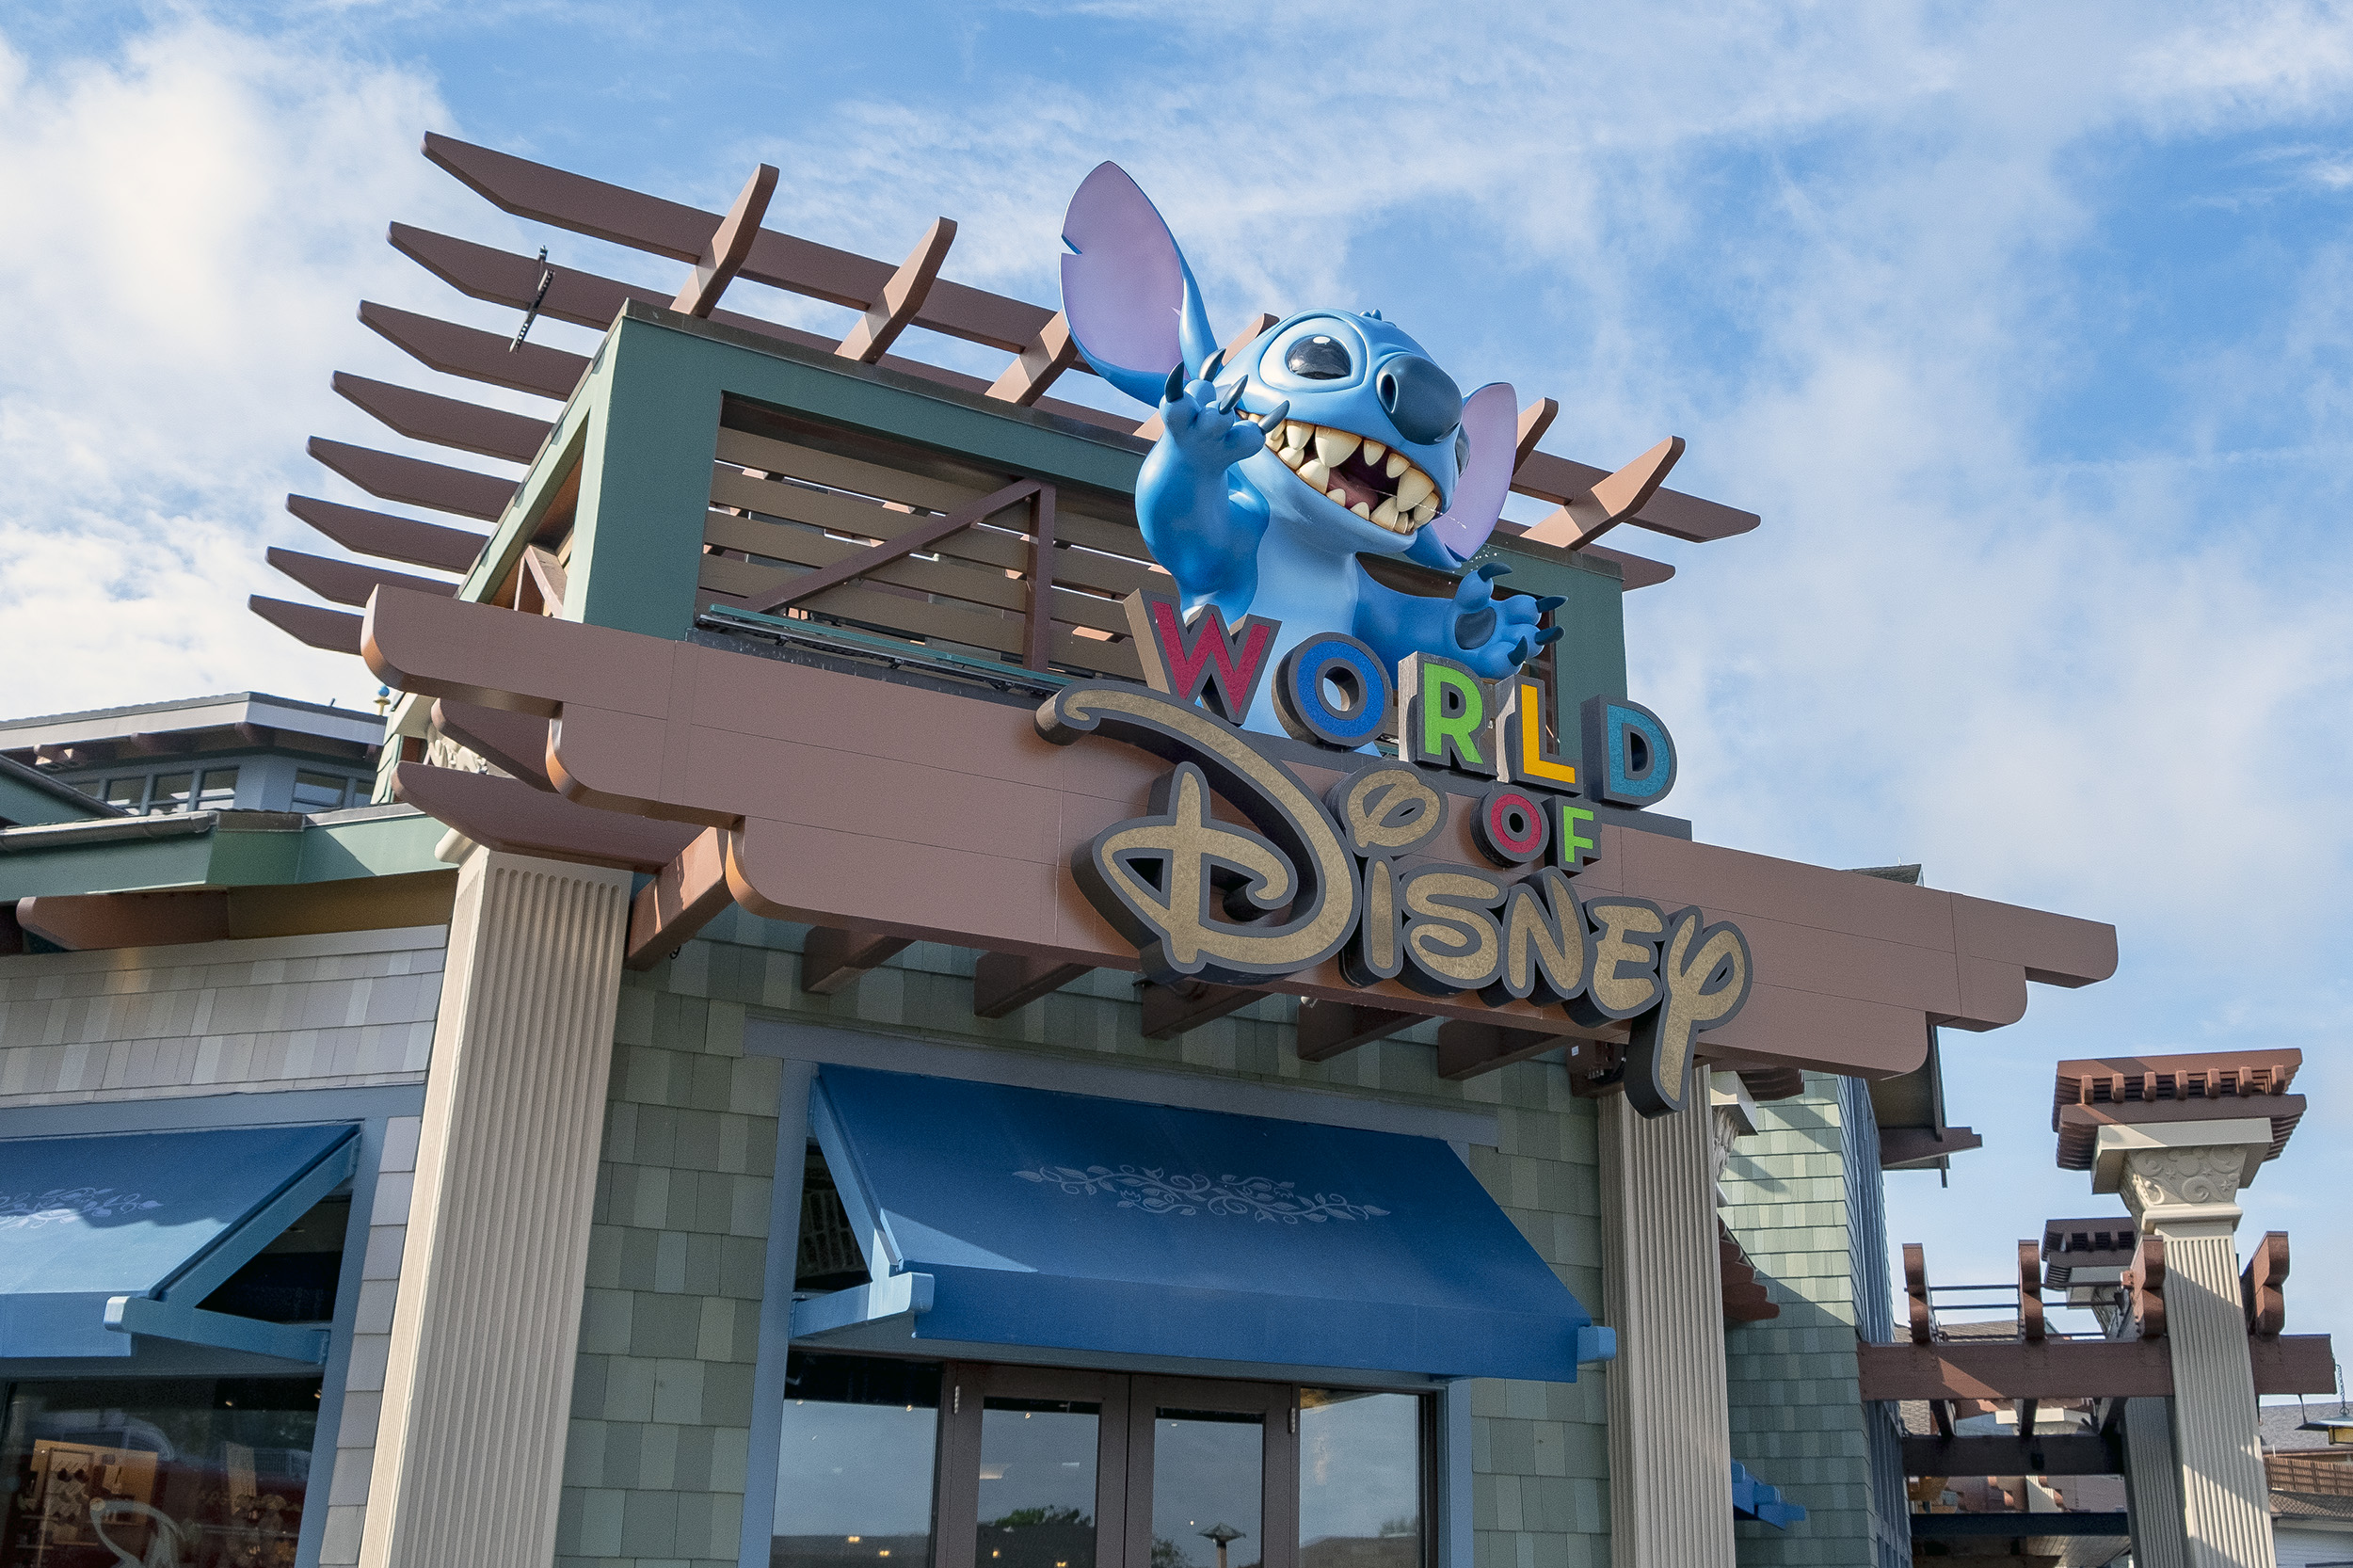 World of Disney Disney Springs Orlando